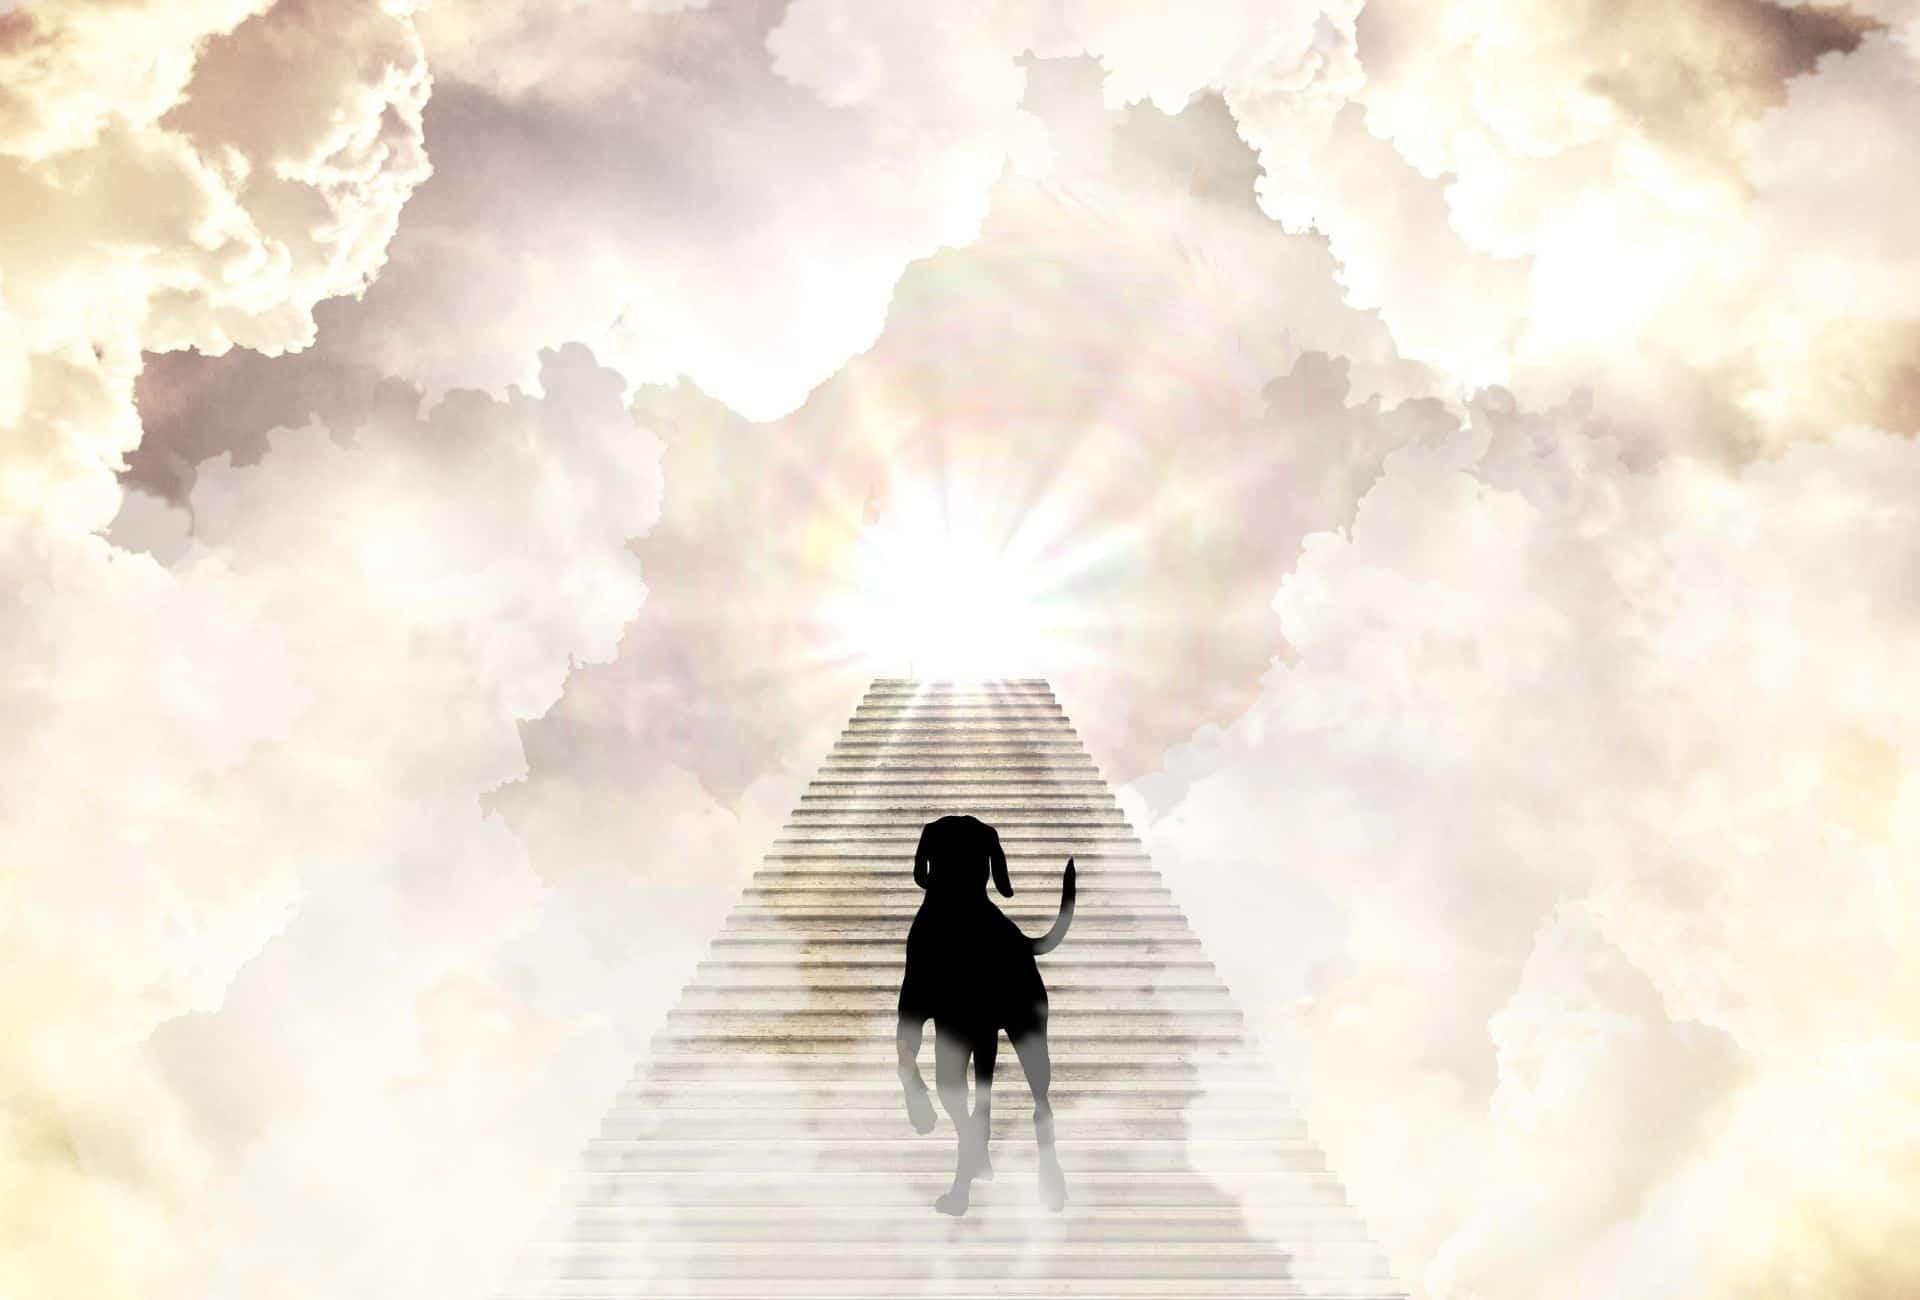 dog soul entering heaven